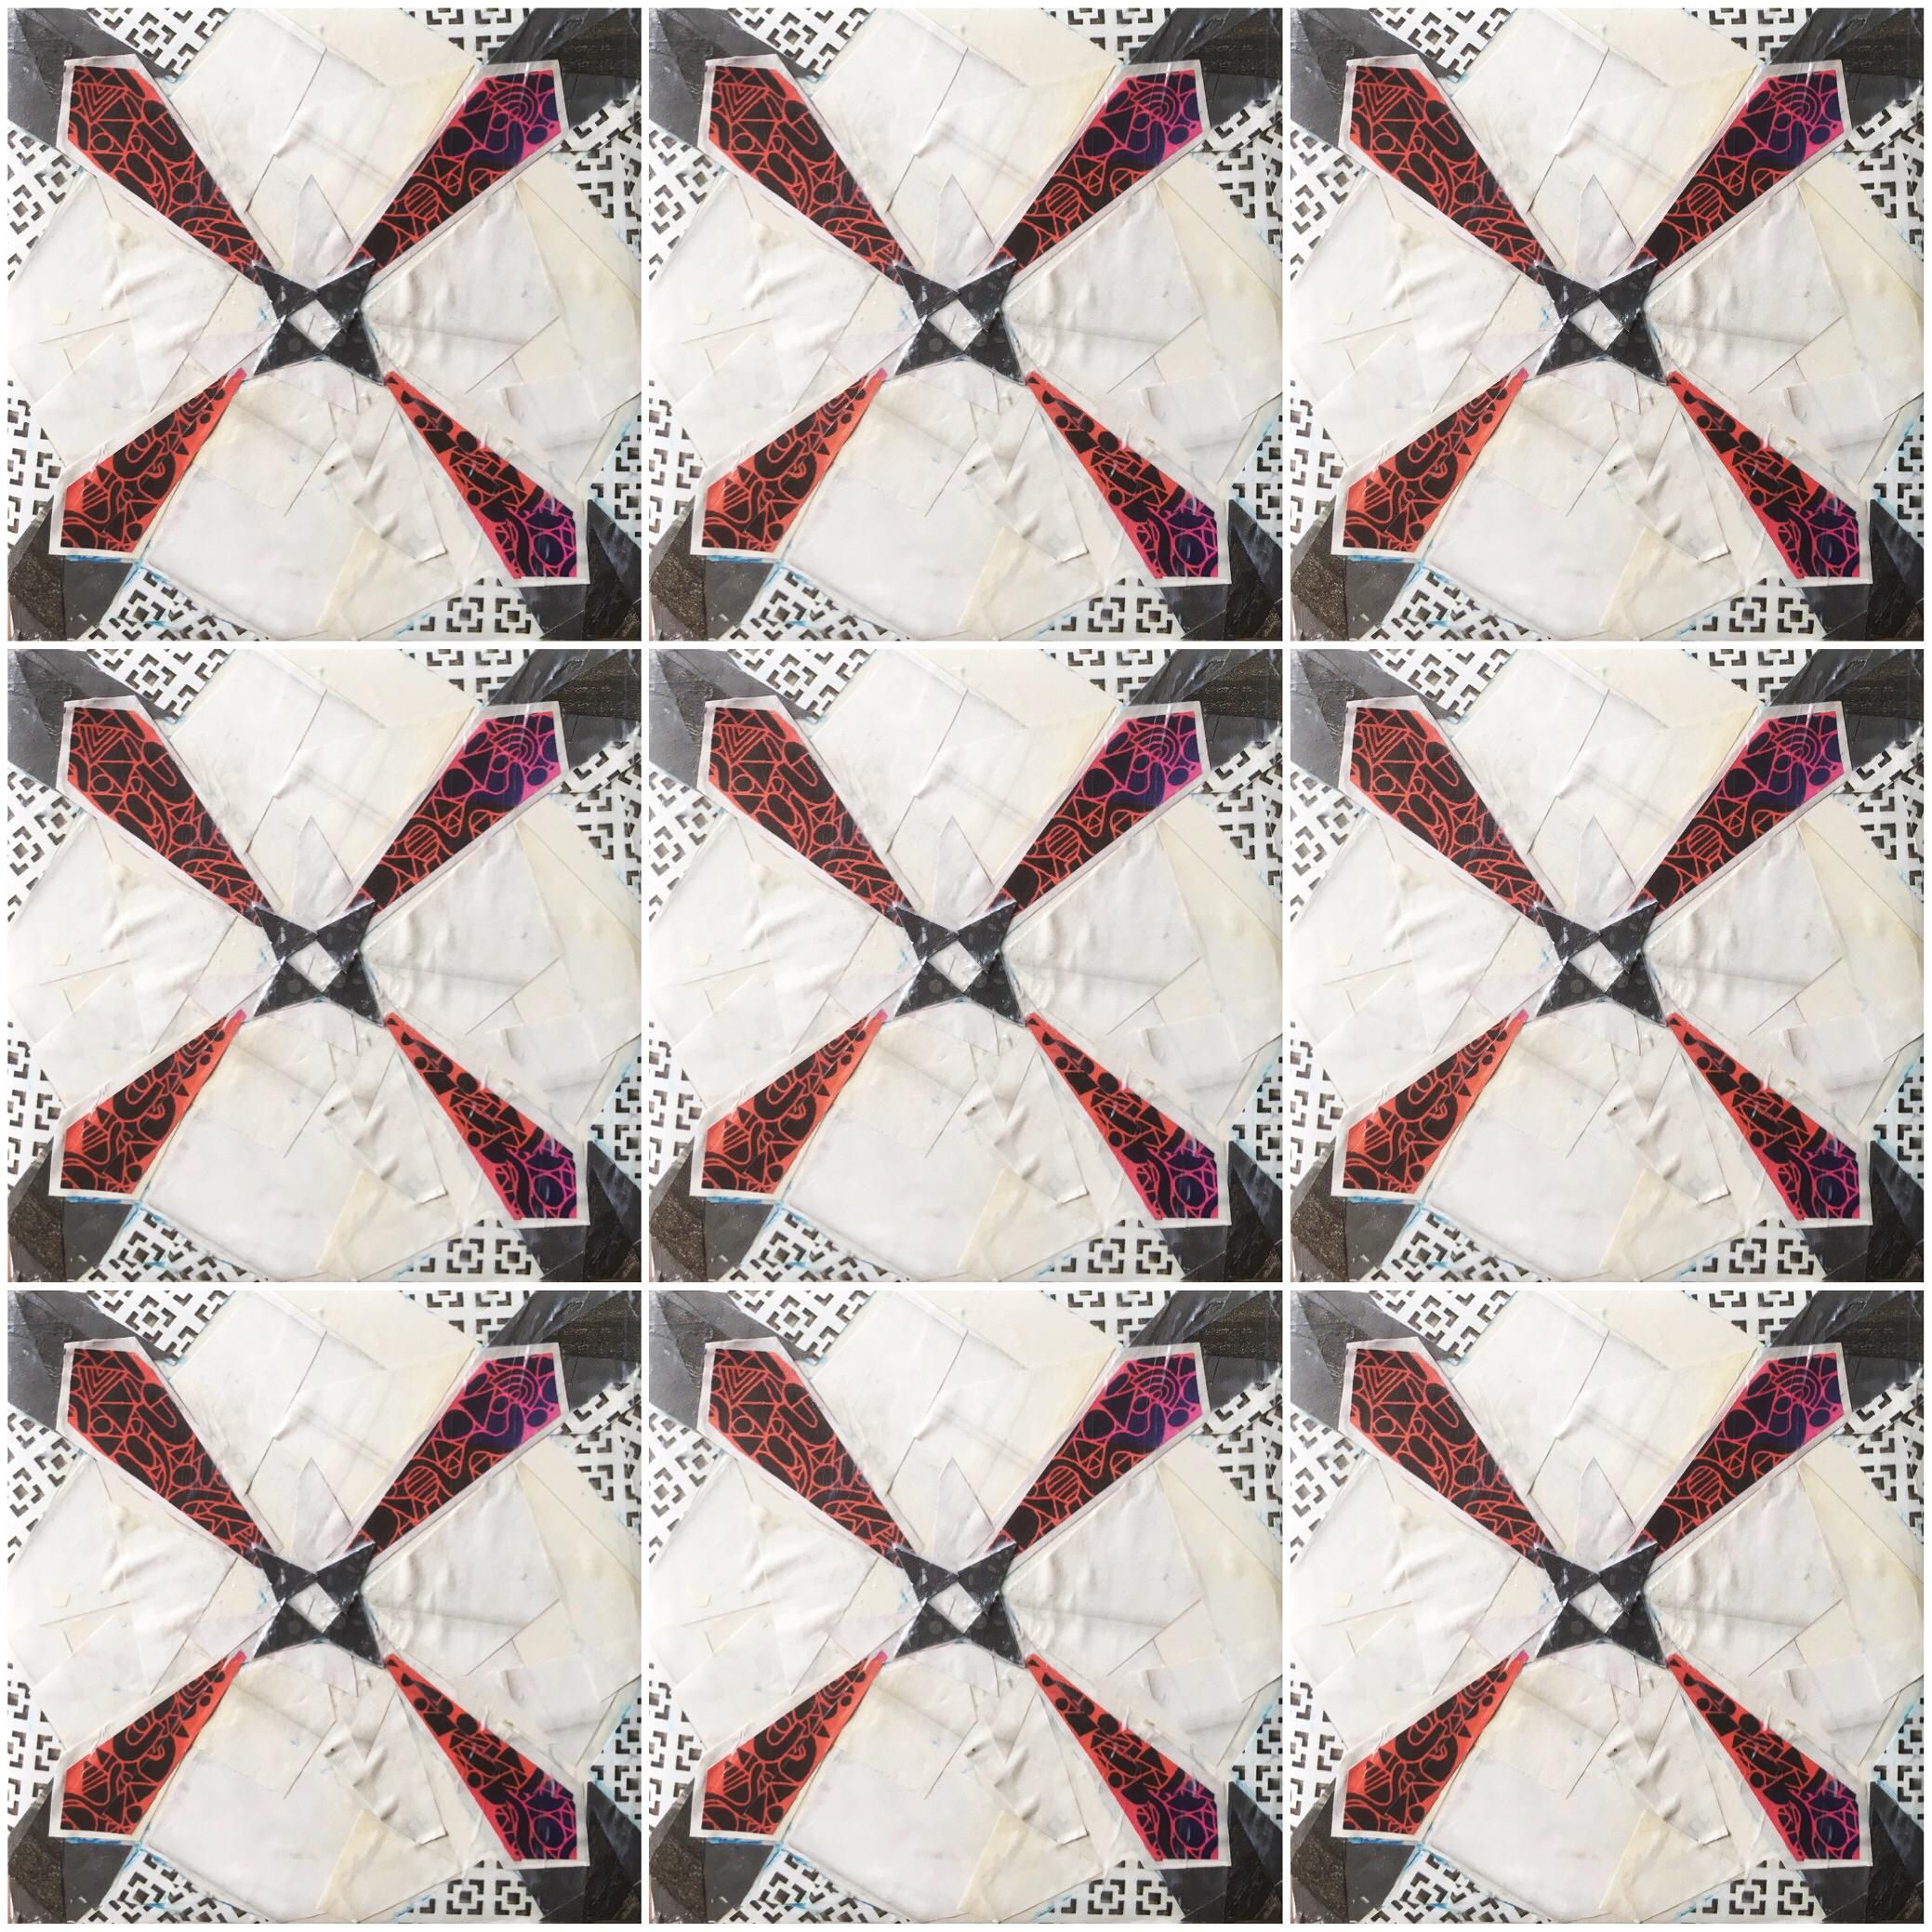 fuschia blac tile repeat.JPG